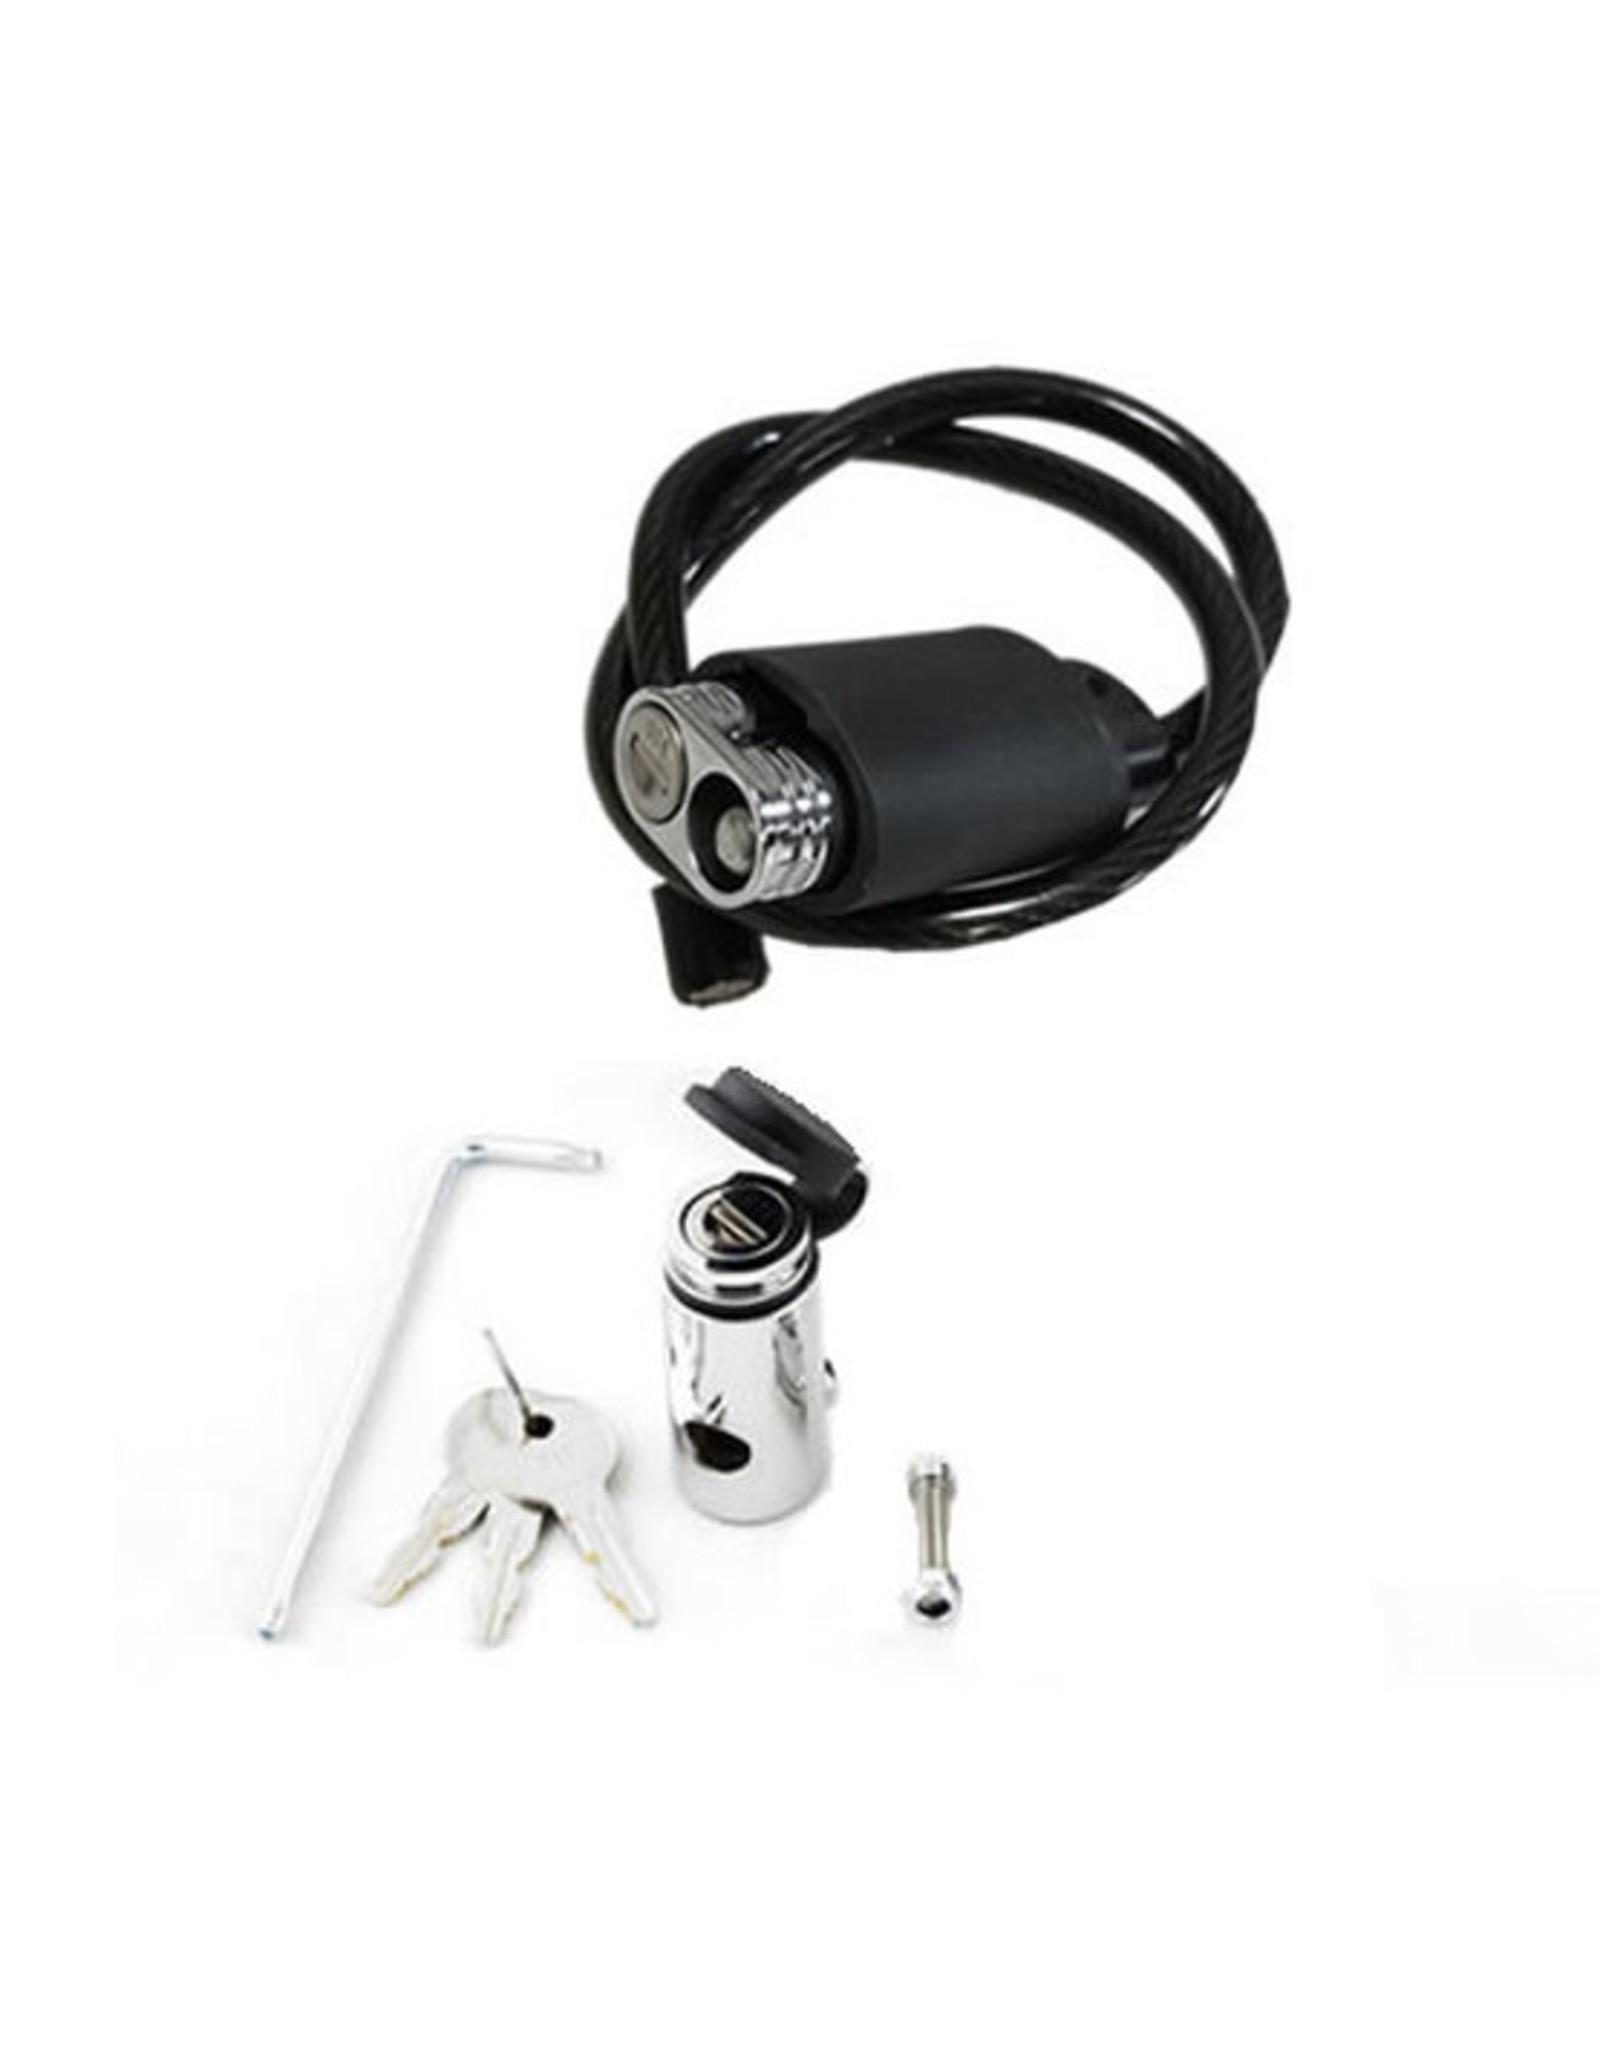 Kuat Kuat Transfer Cable Lock Kit w/ Locking Hitch Pin